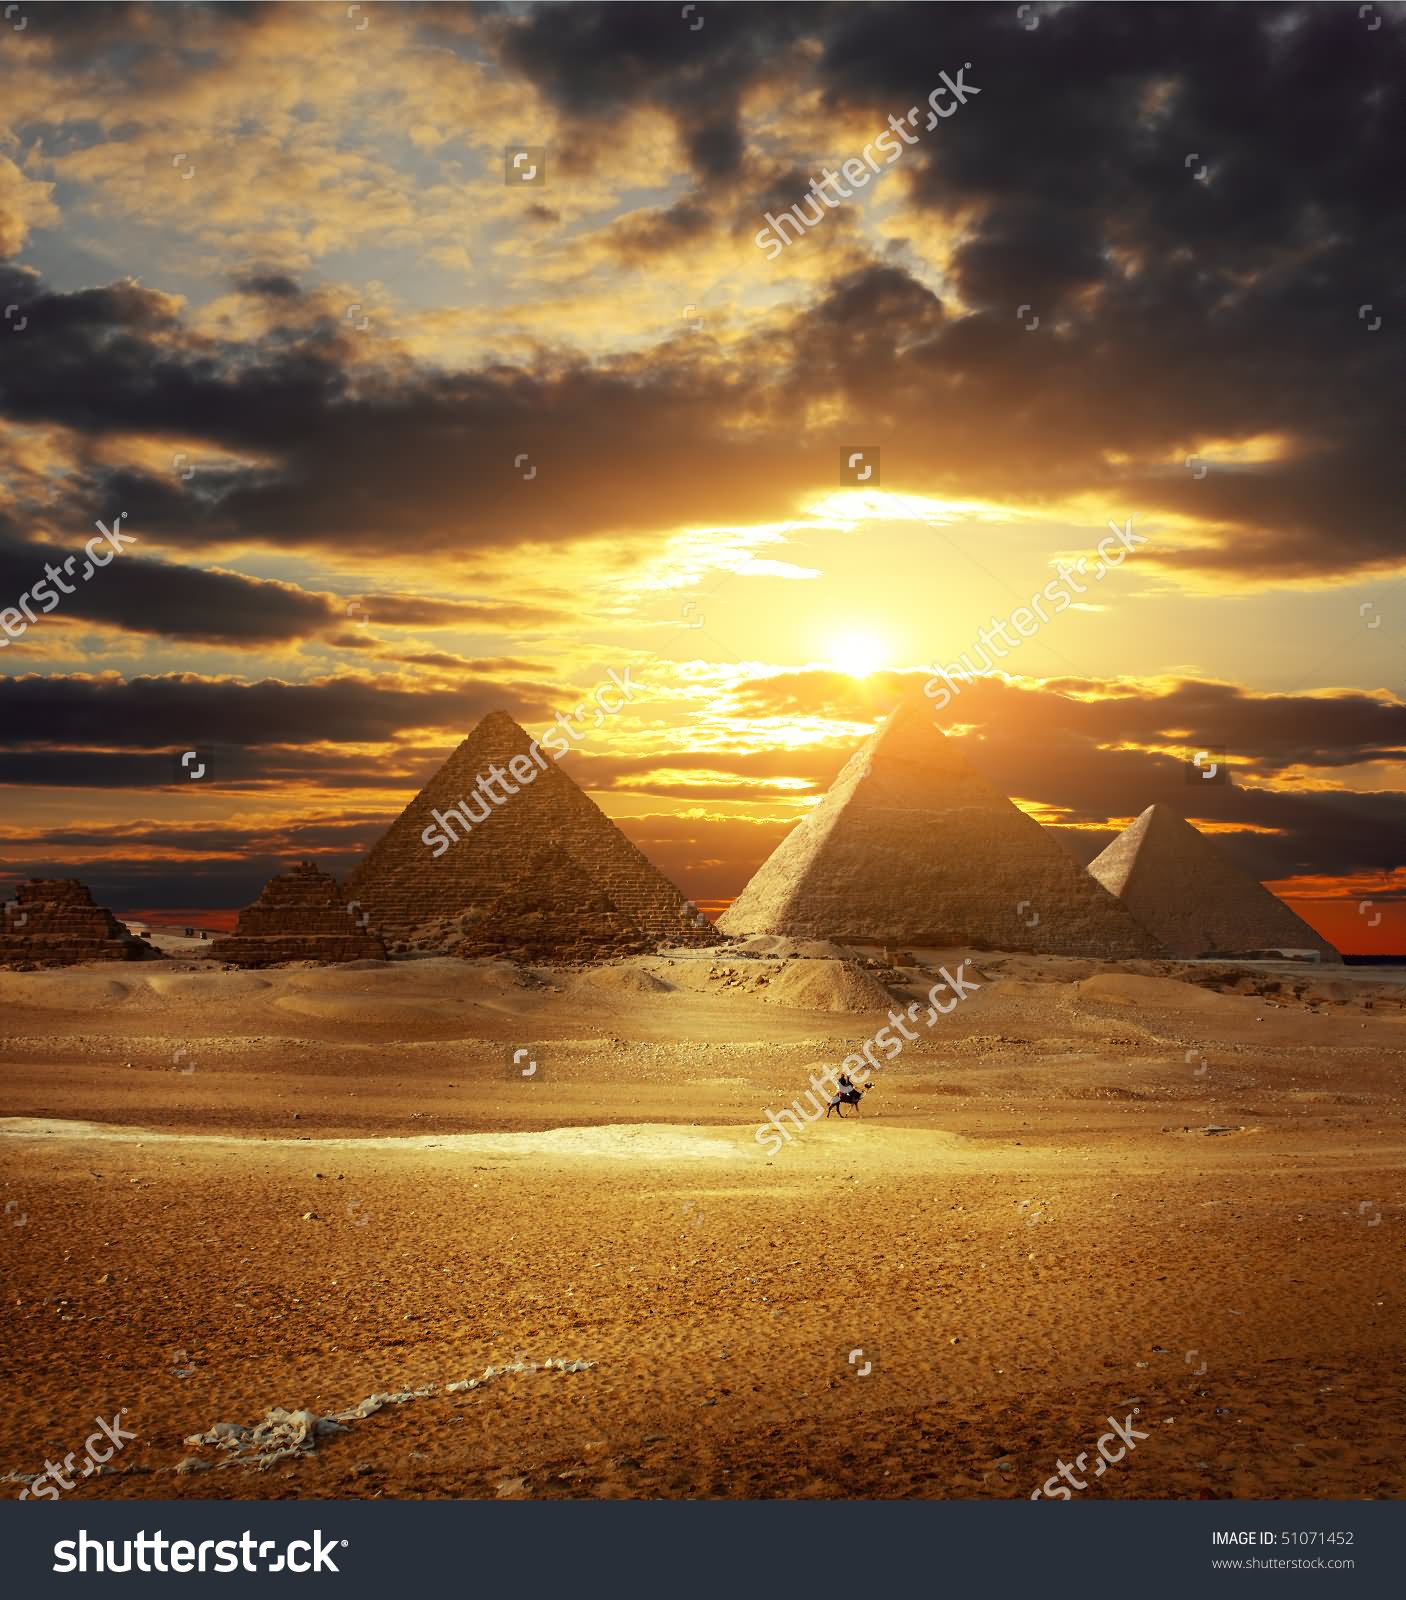 Sunset Over Egyptian Pyramids